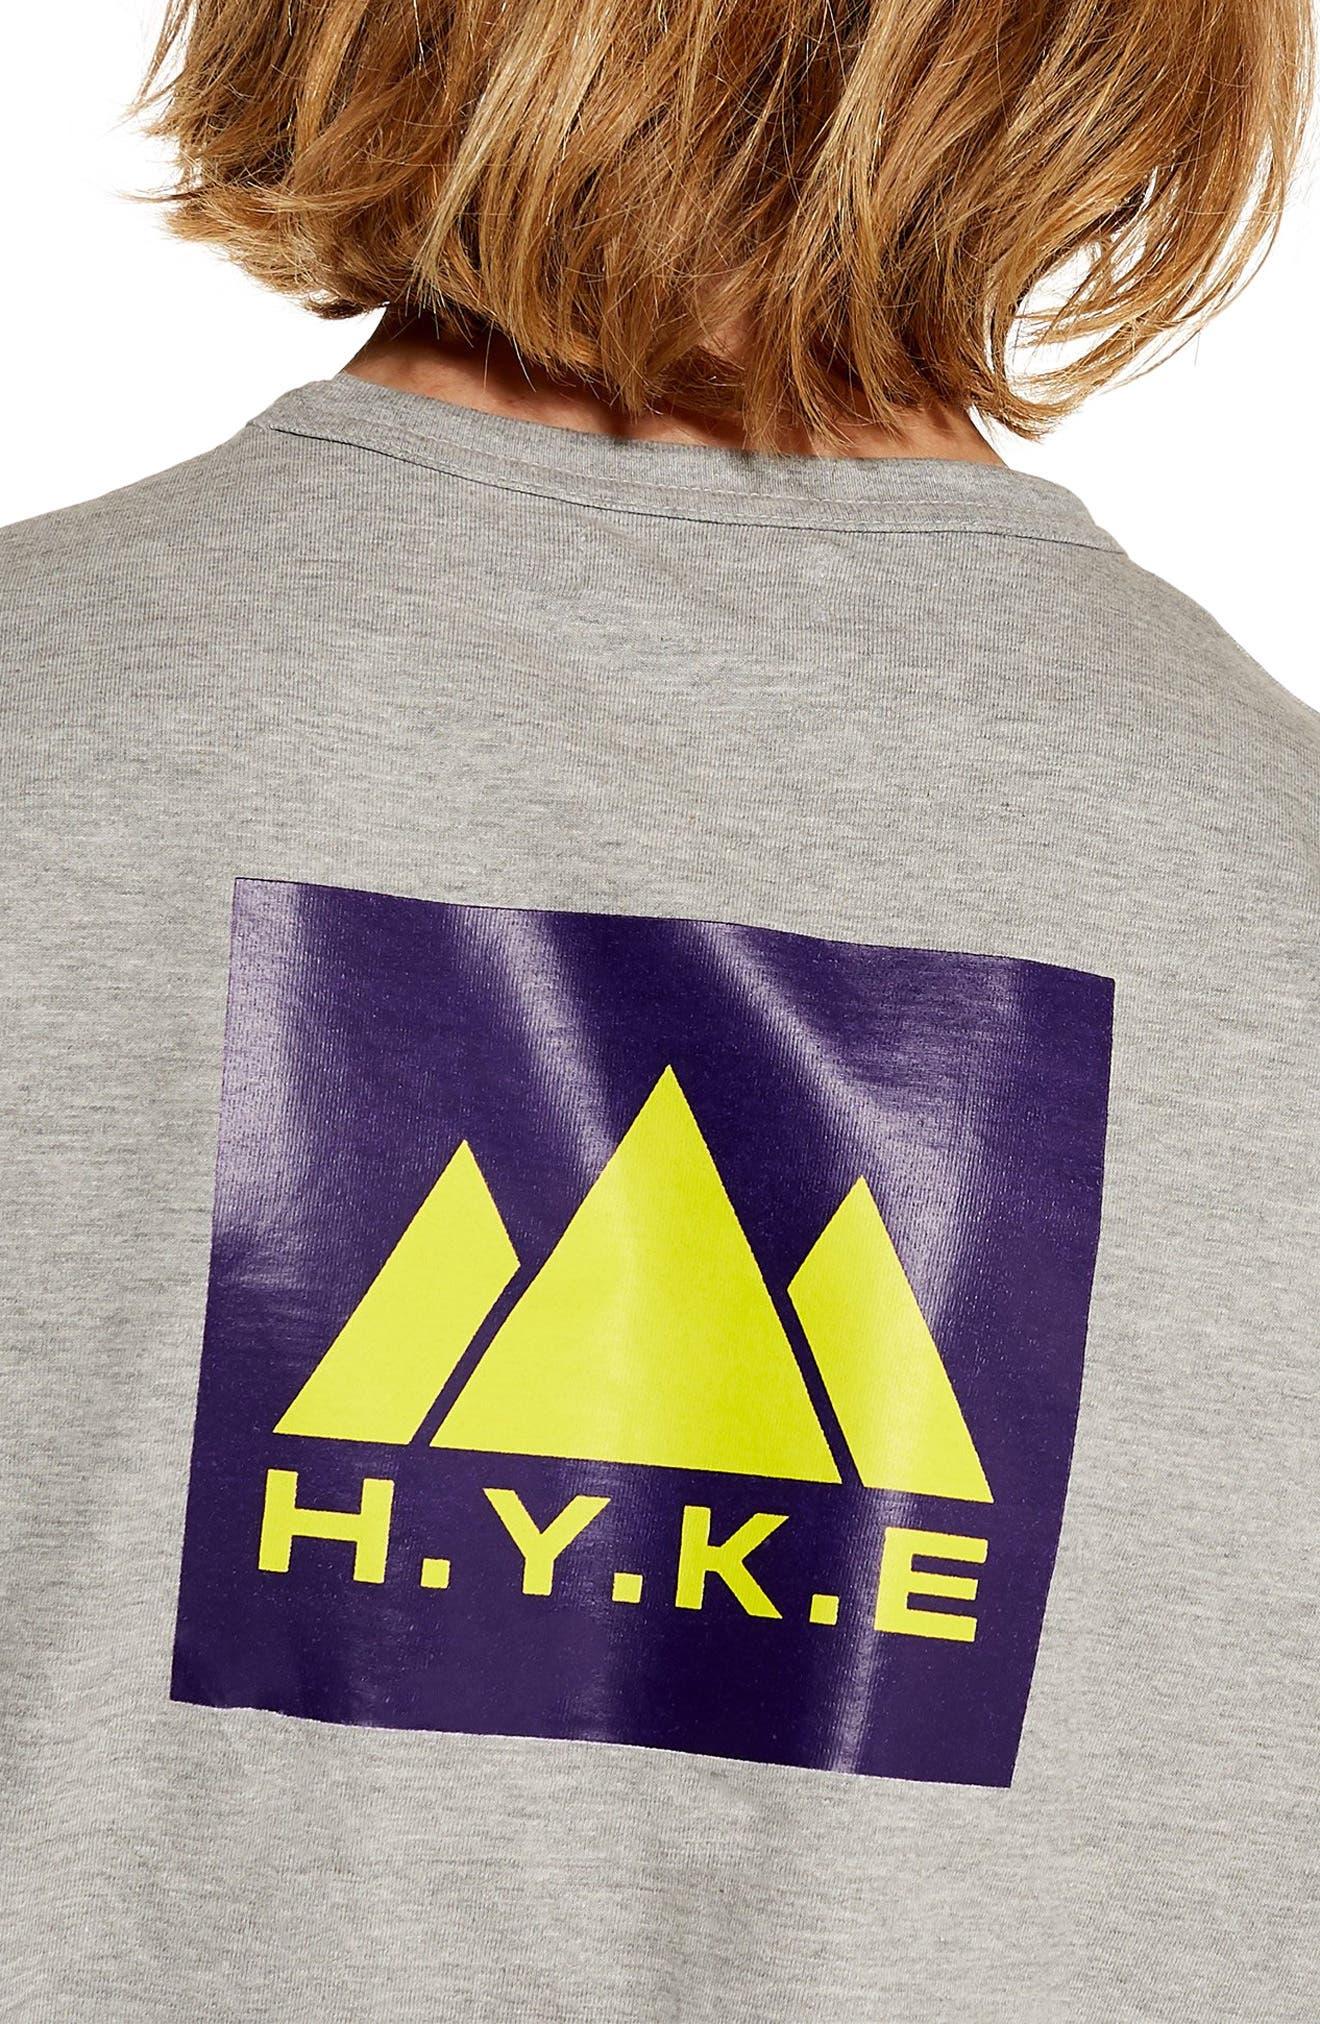 H.Y.K.E. Graphic T-Shirt,                             Alternate thumbnail 3, color,                             GREY